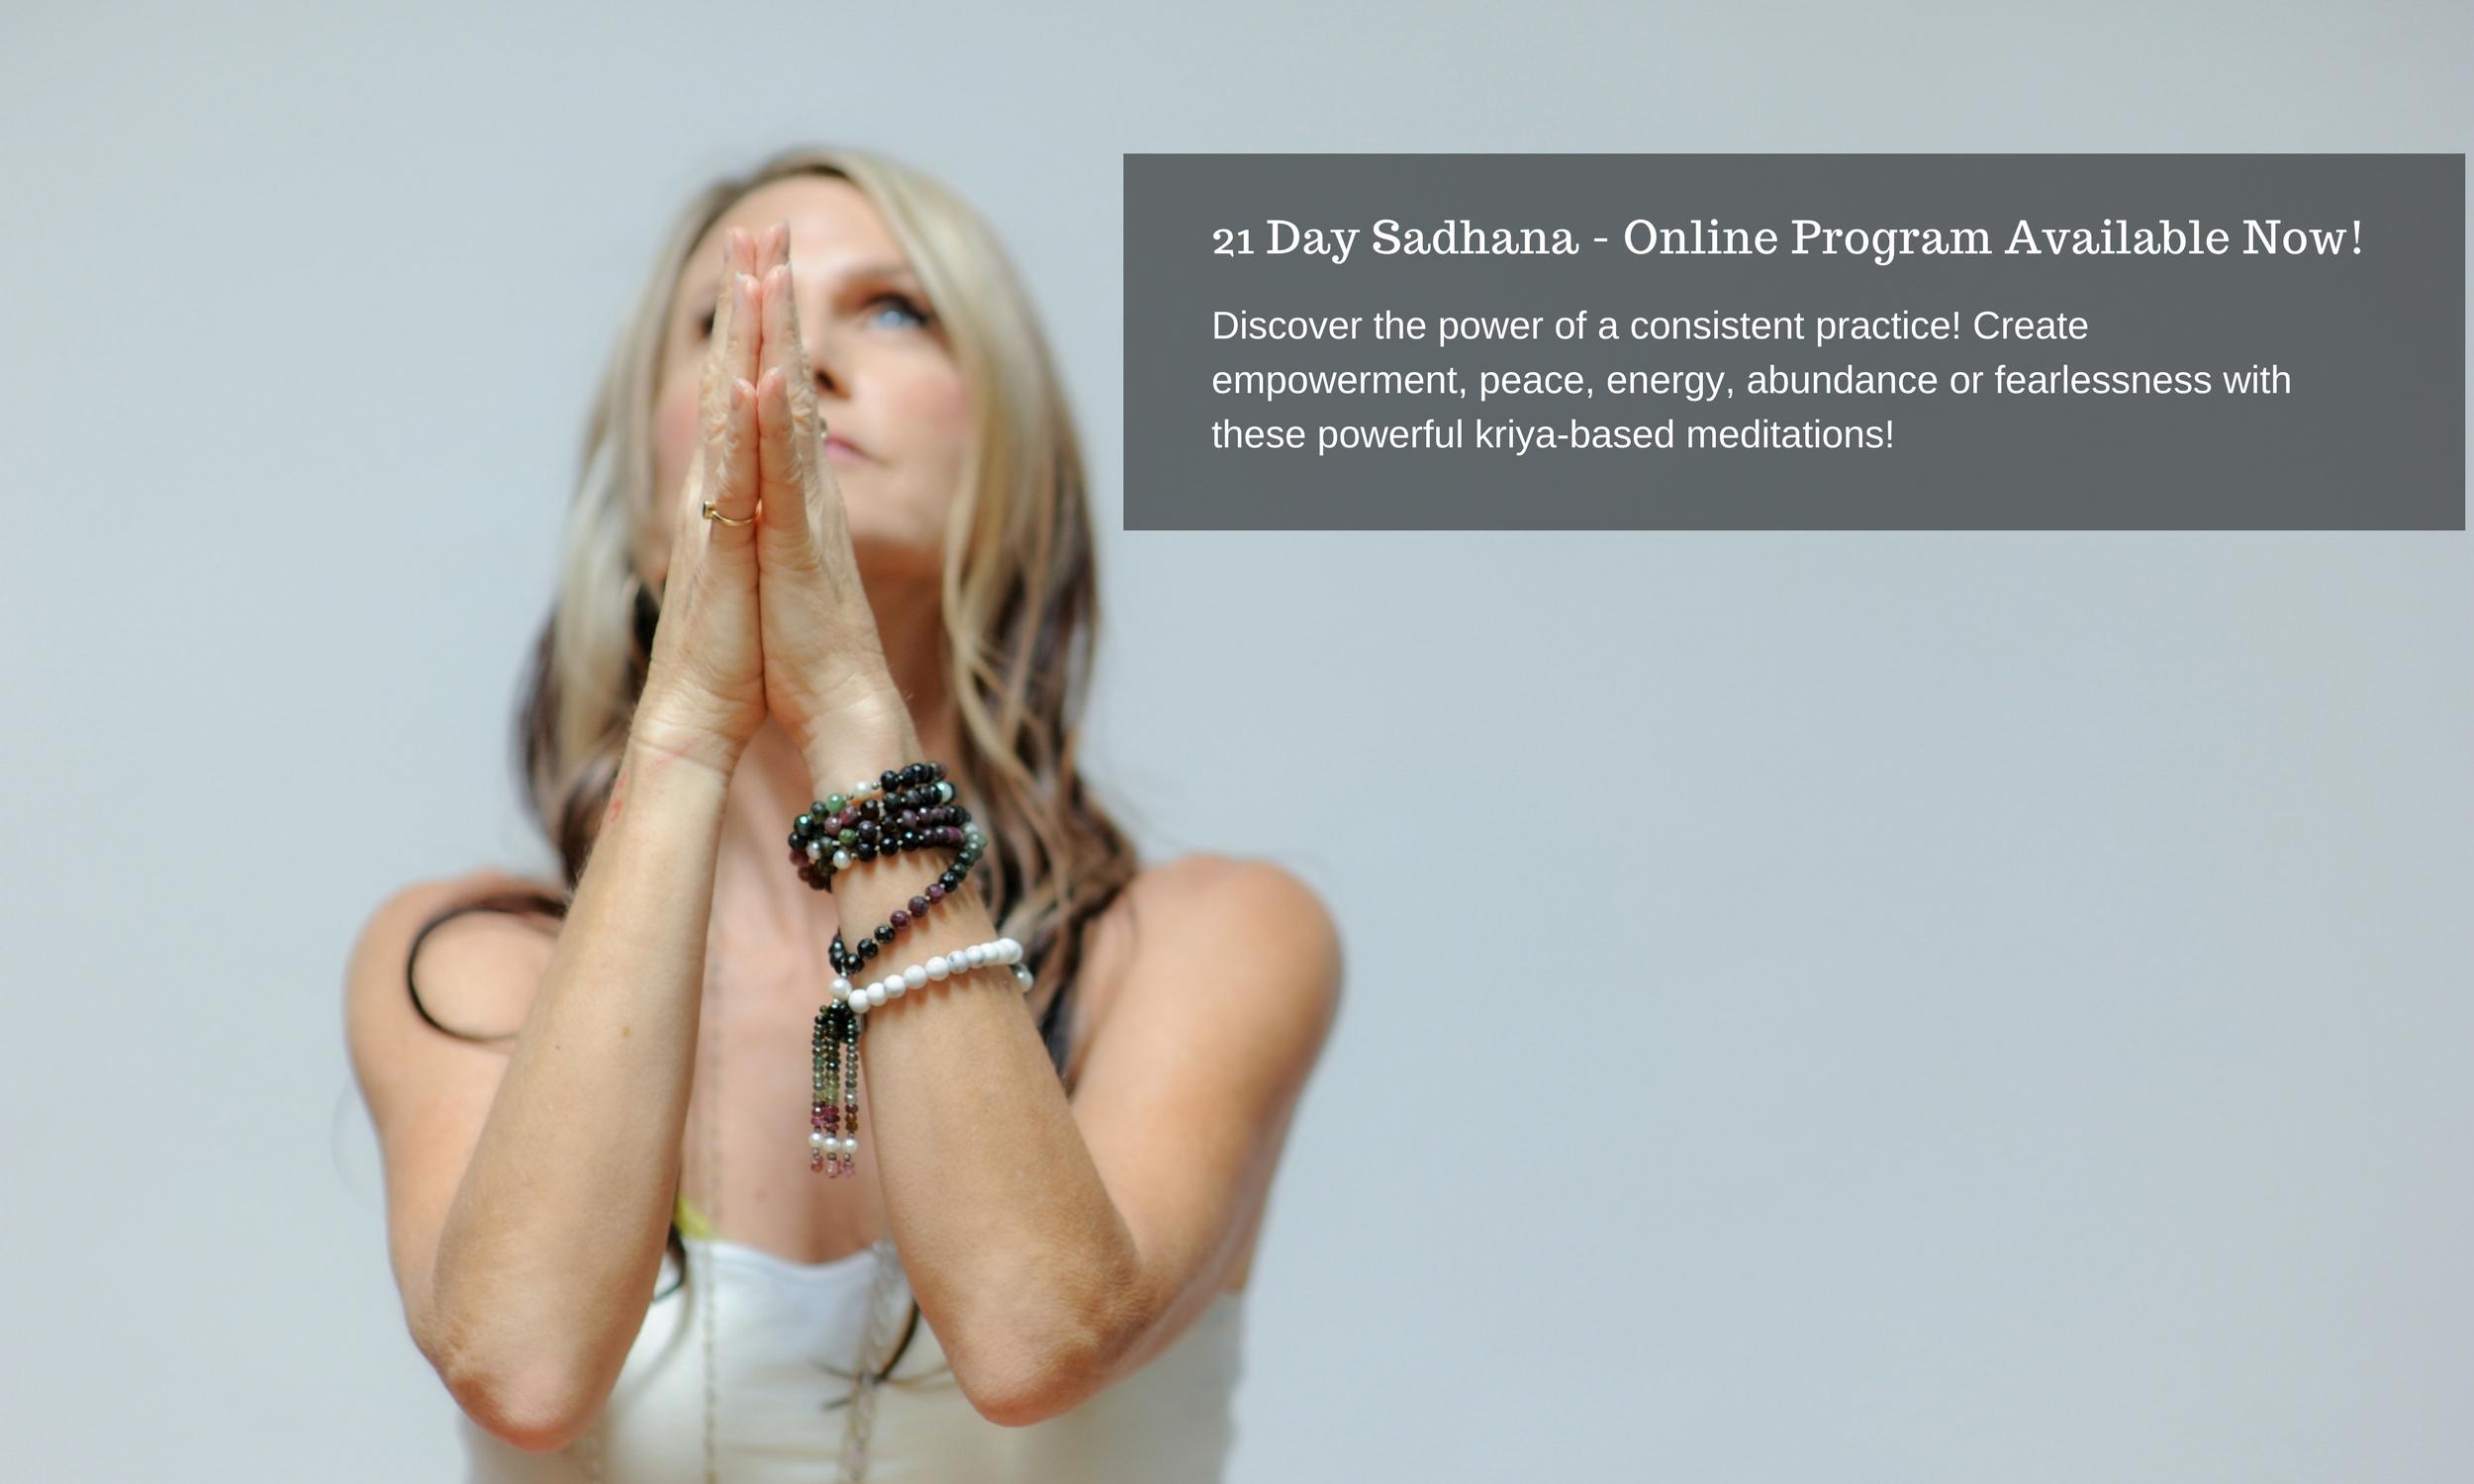 21 Day Sadhana - Online Program Available Now!.jpg